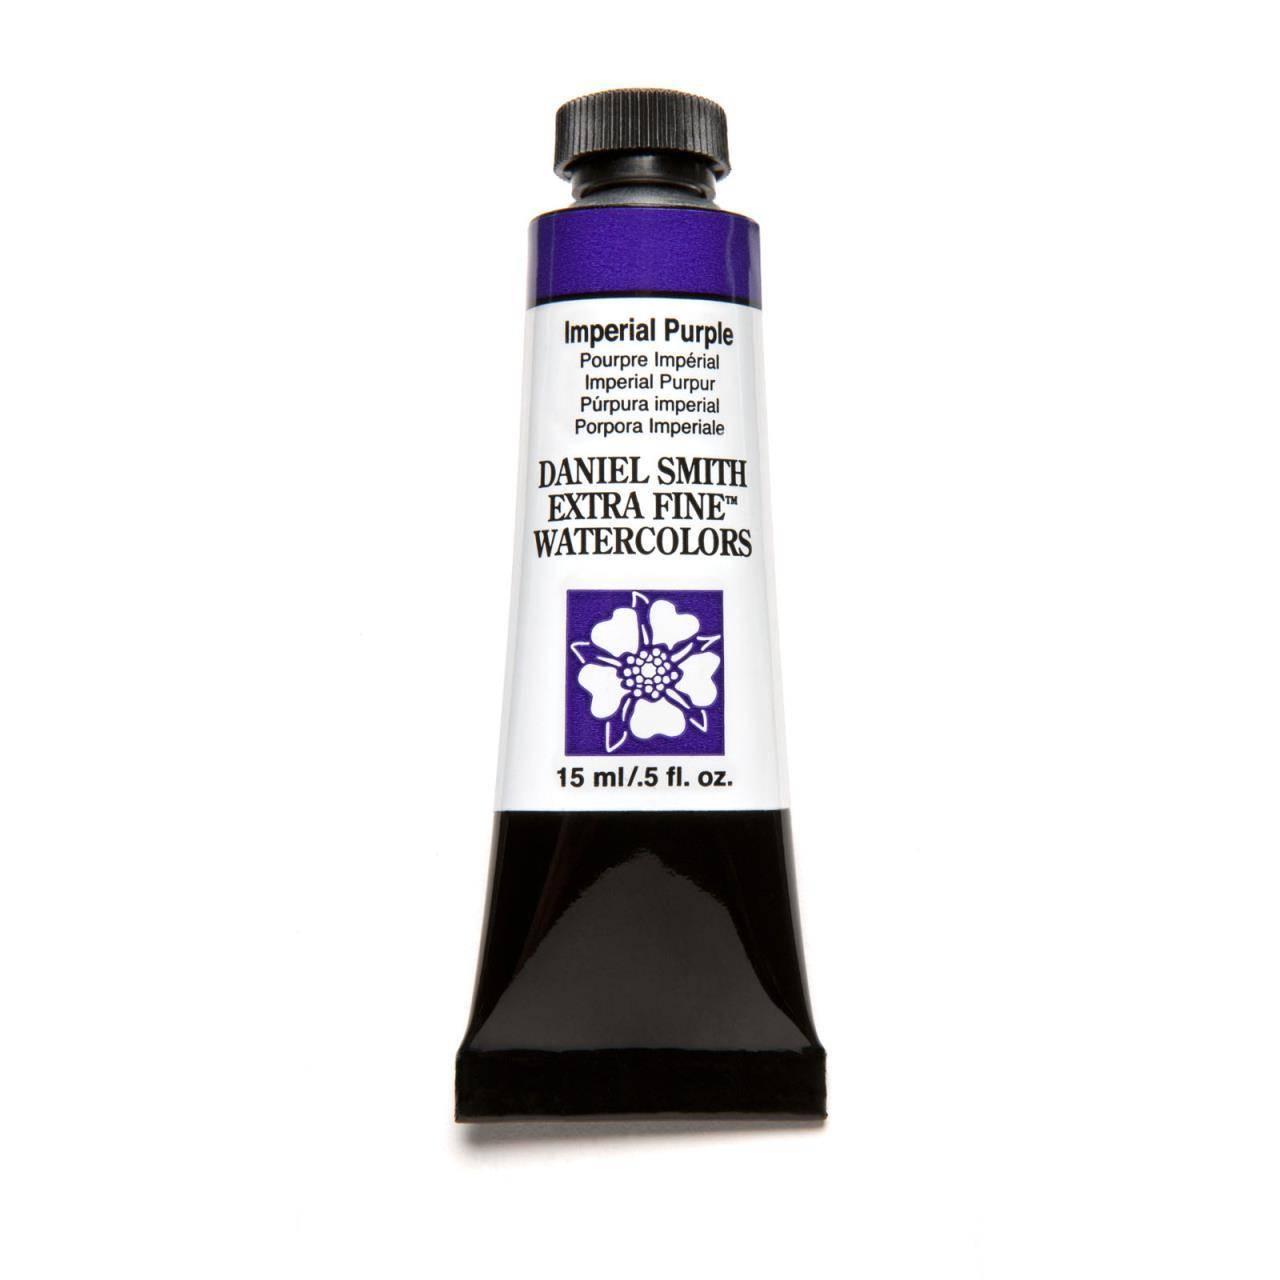 Daniel Smith Imperial Purple